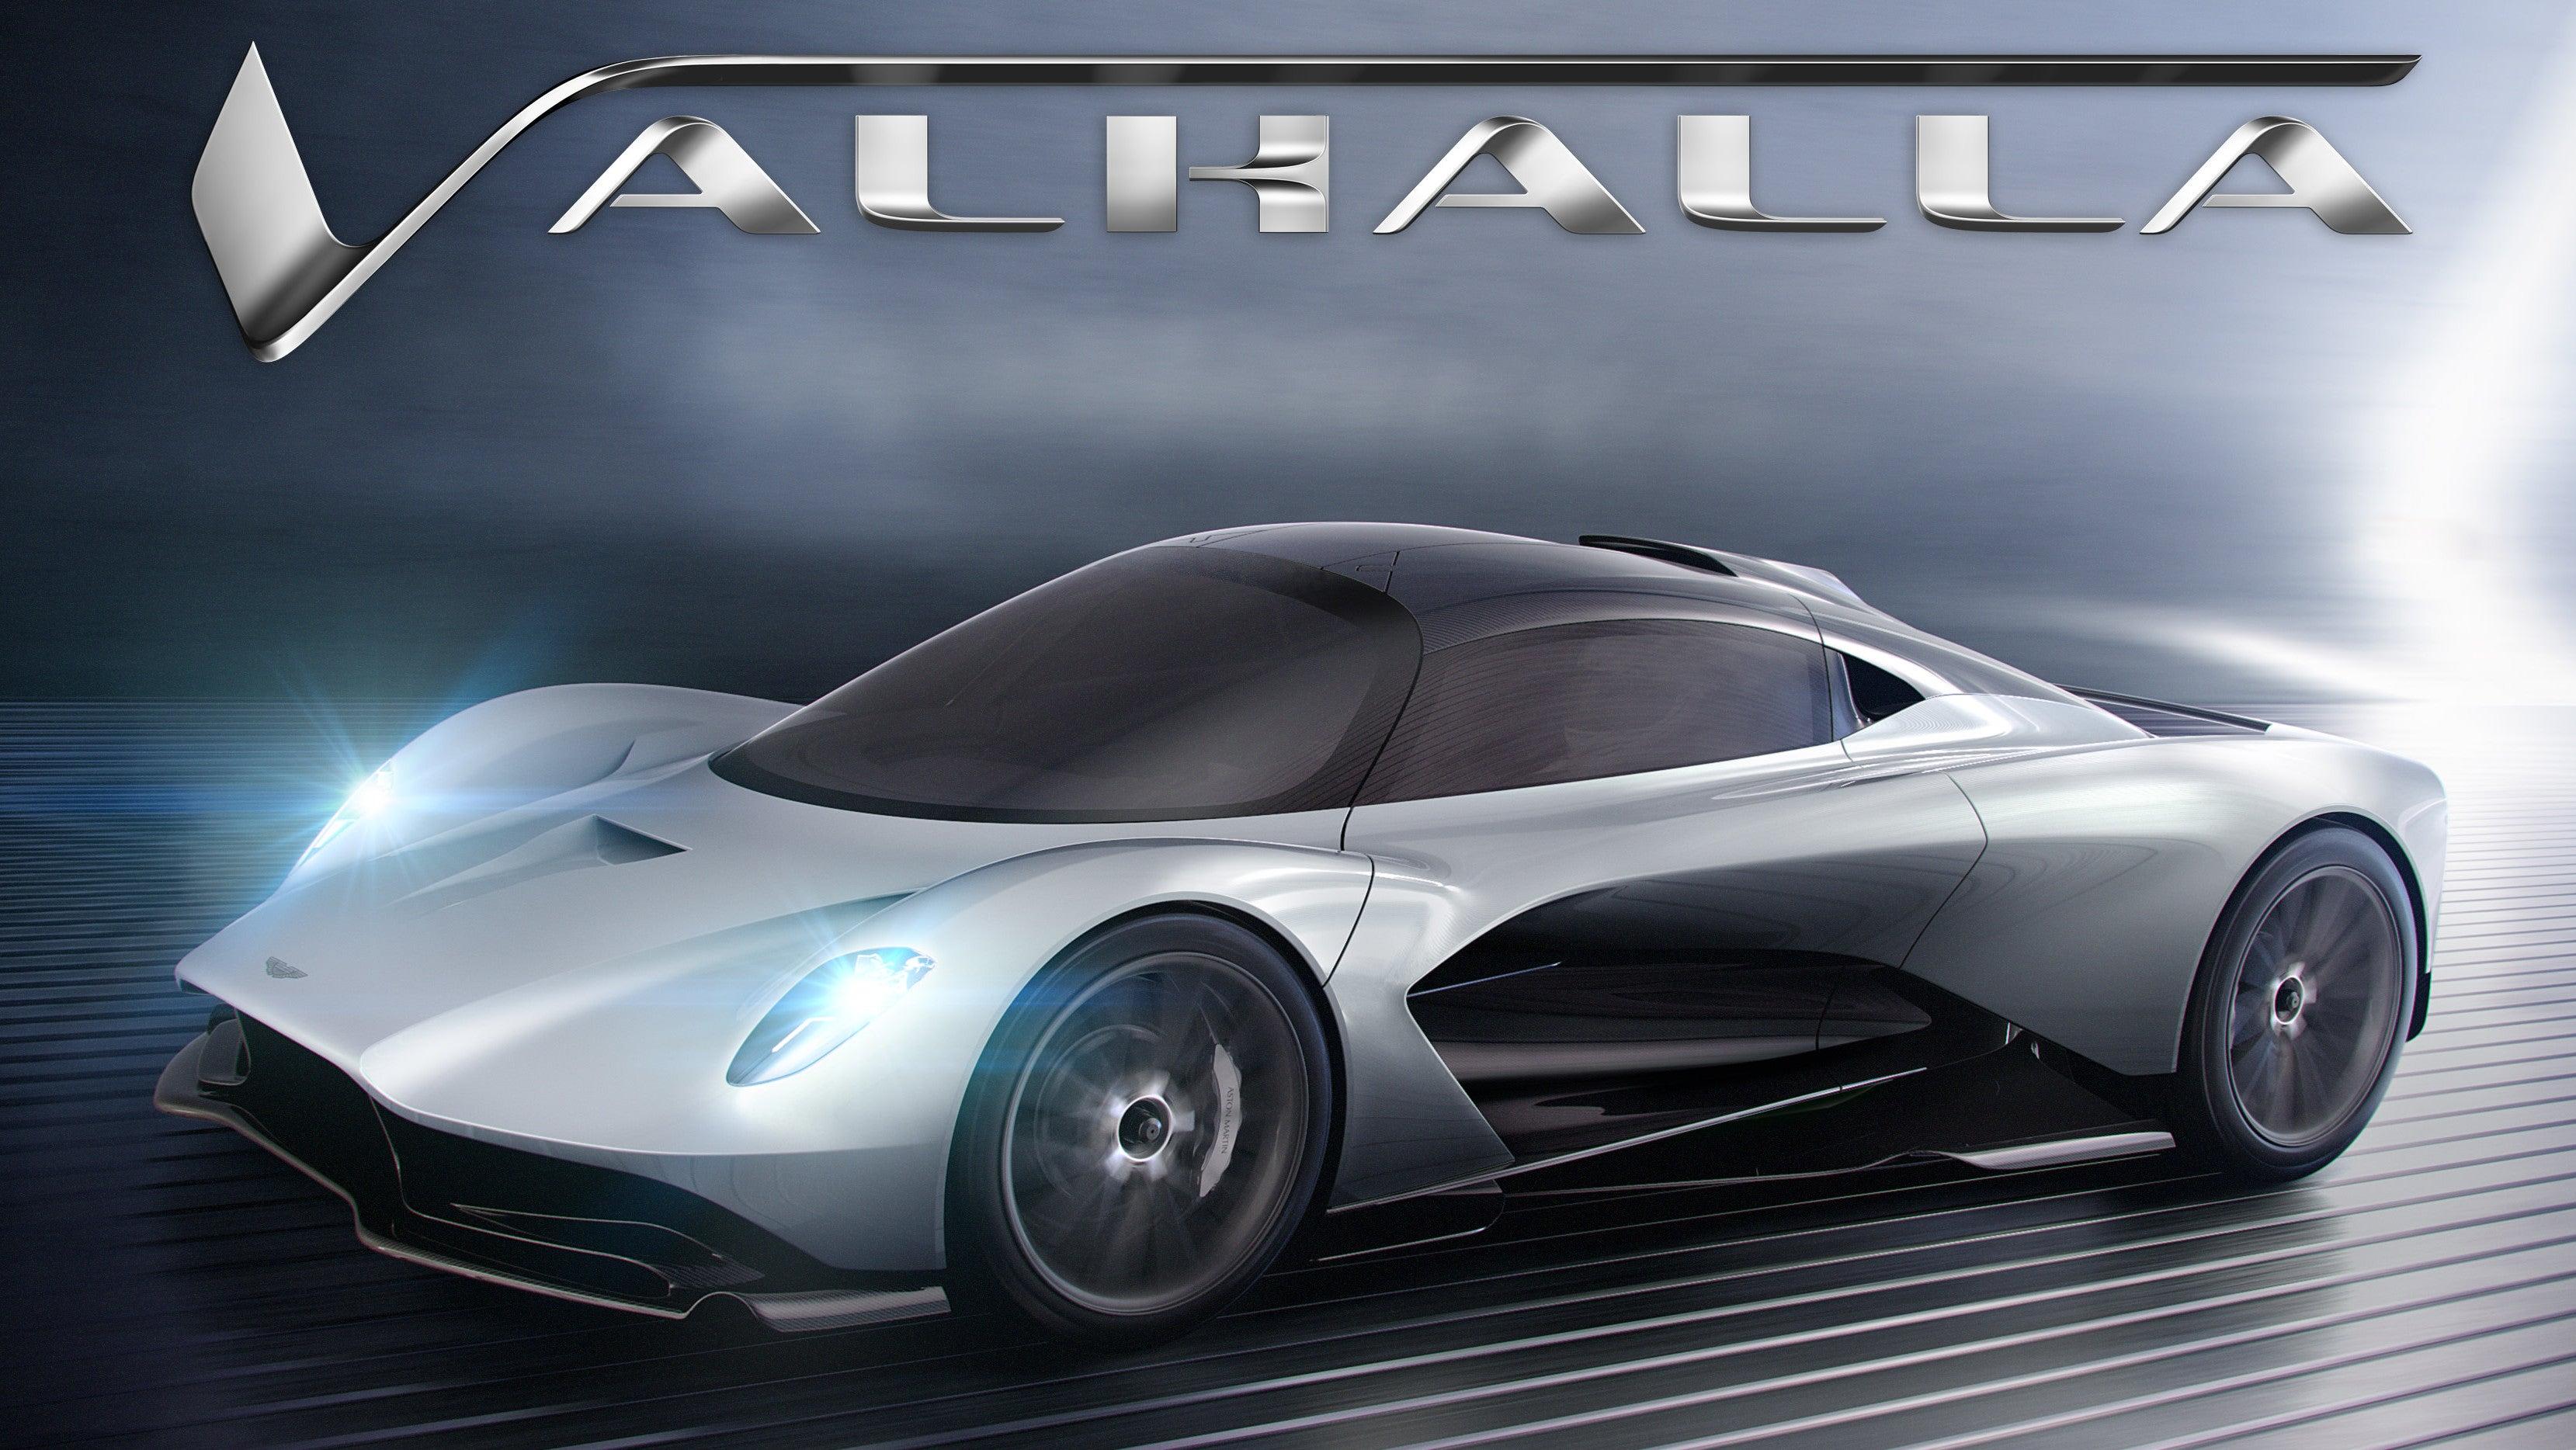 James Bond Will Drive The New Aston Martin Valhalla In Bond 25: Report